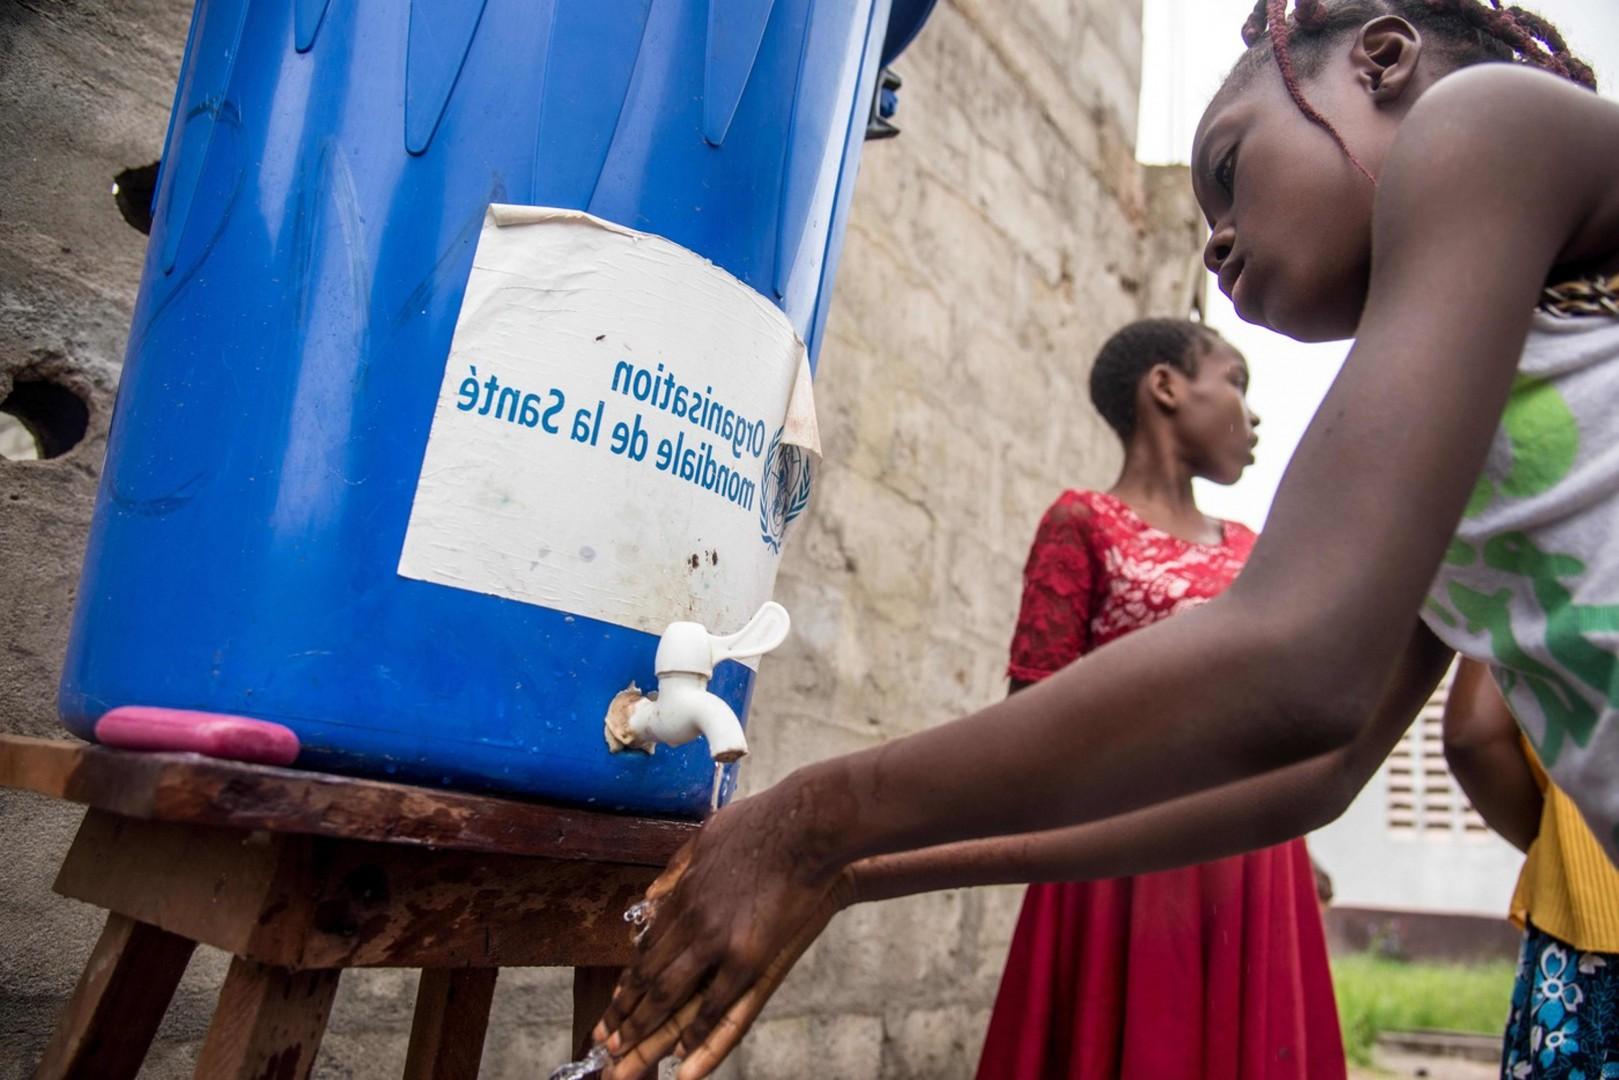 Torna l'ebola in Congo (LaPresse)